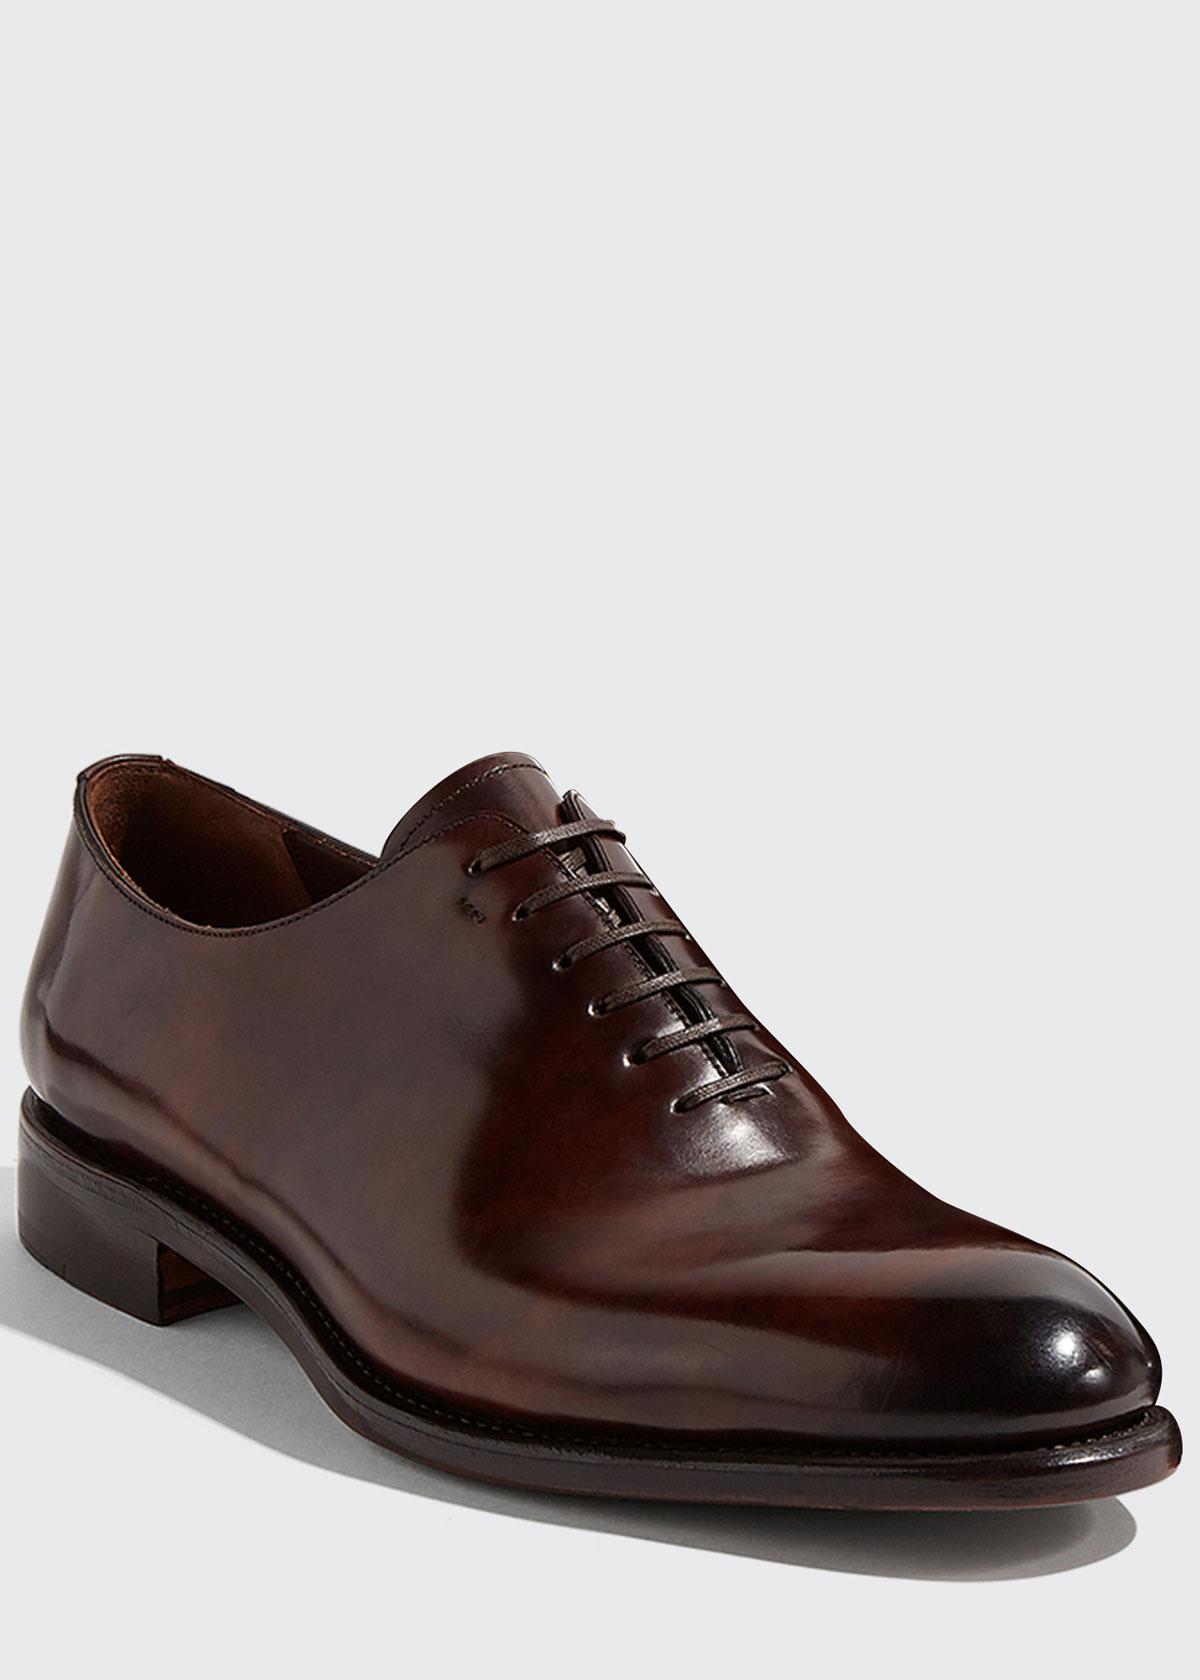 Salvatore Ferragamo Men's Angiolo Tramezza Whole-Cut Leather Lace-Up Shoes  - AFRICA - Size: 11